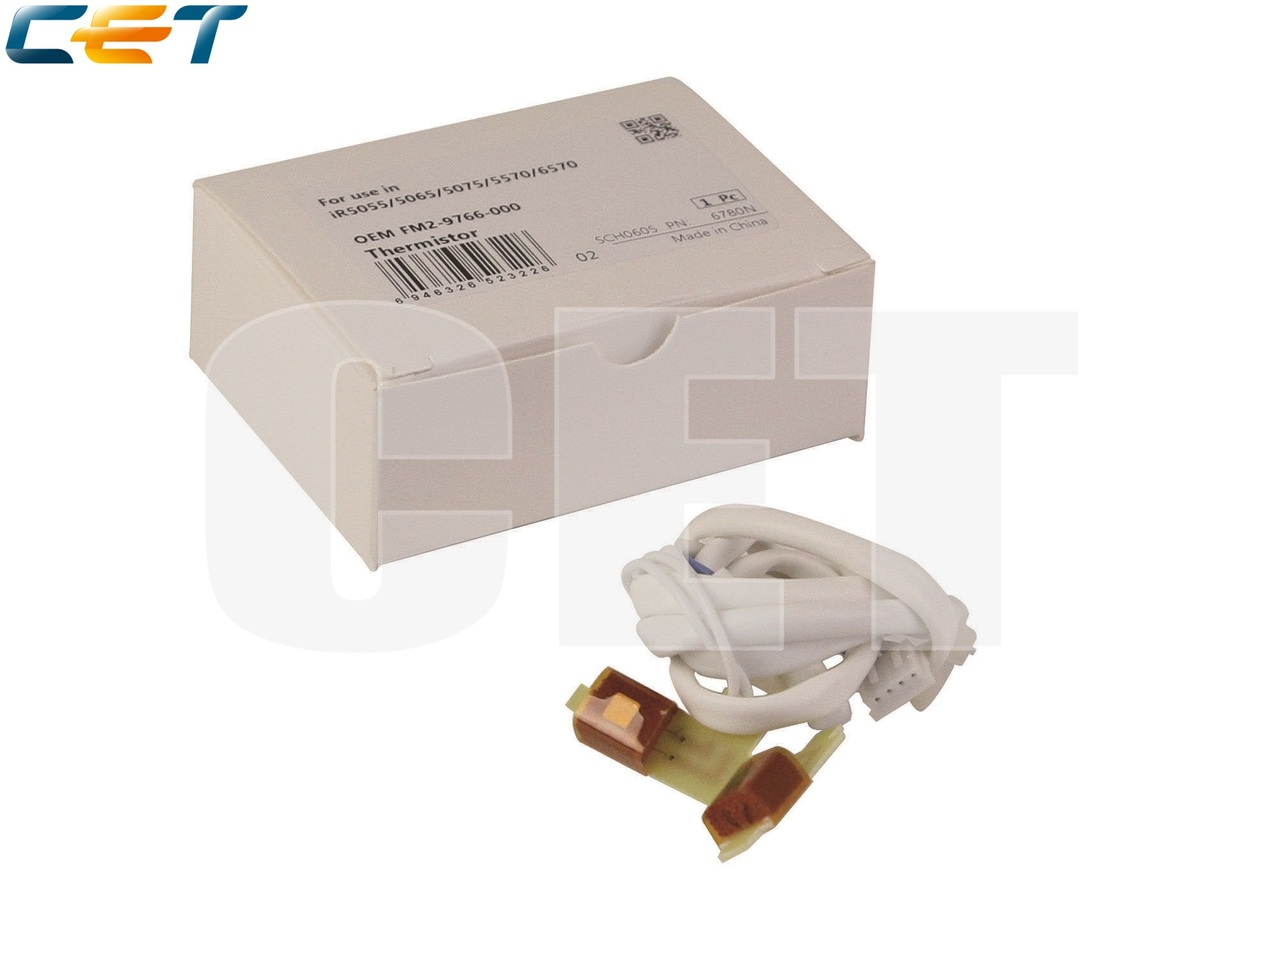 Термистор FM2-9766-000 для CANONiR5055/5065/5075/5070/6570 (CET), CET6780N